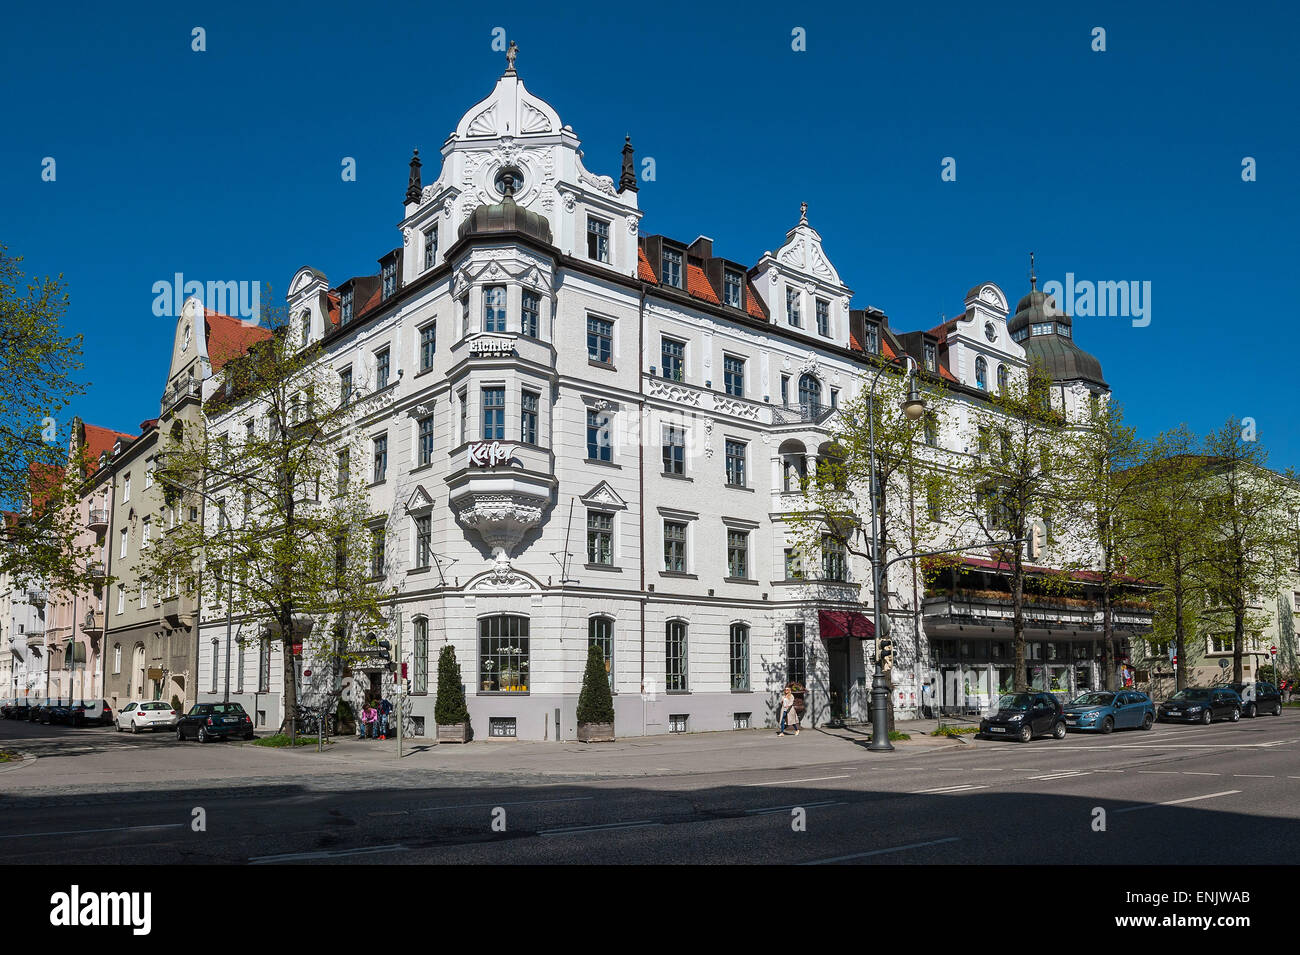 Mansion facade, Feinkost Käfer, Munich, Upper Bavaria, Bavaria, Germany - Stock Image